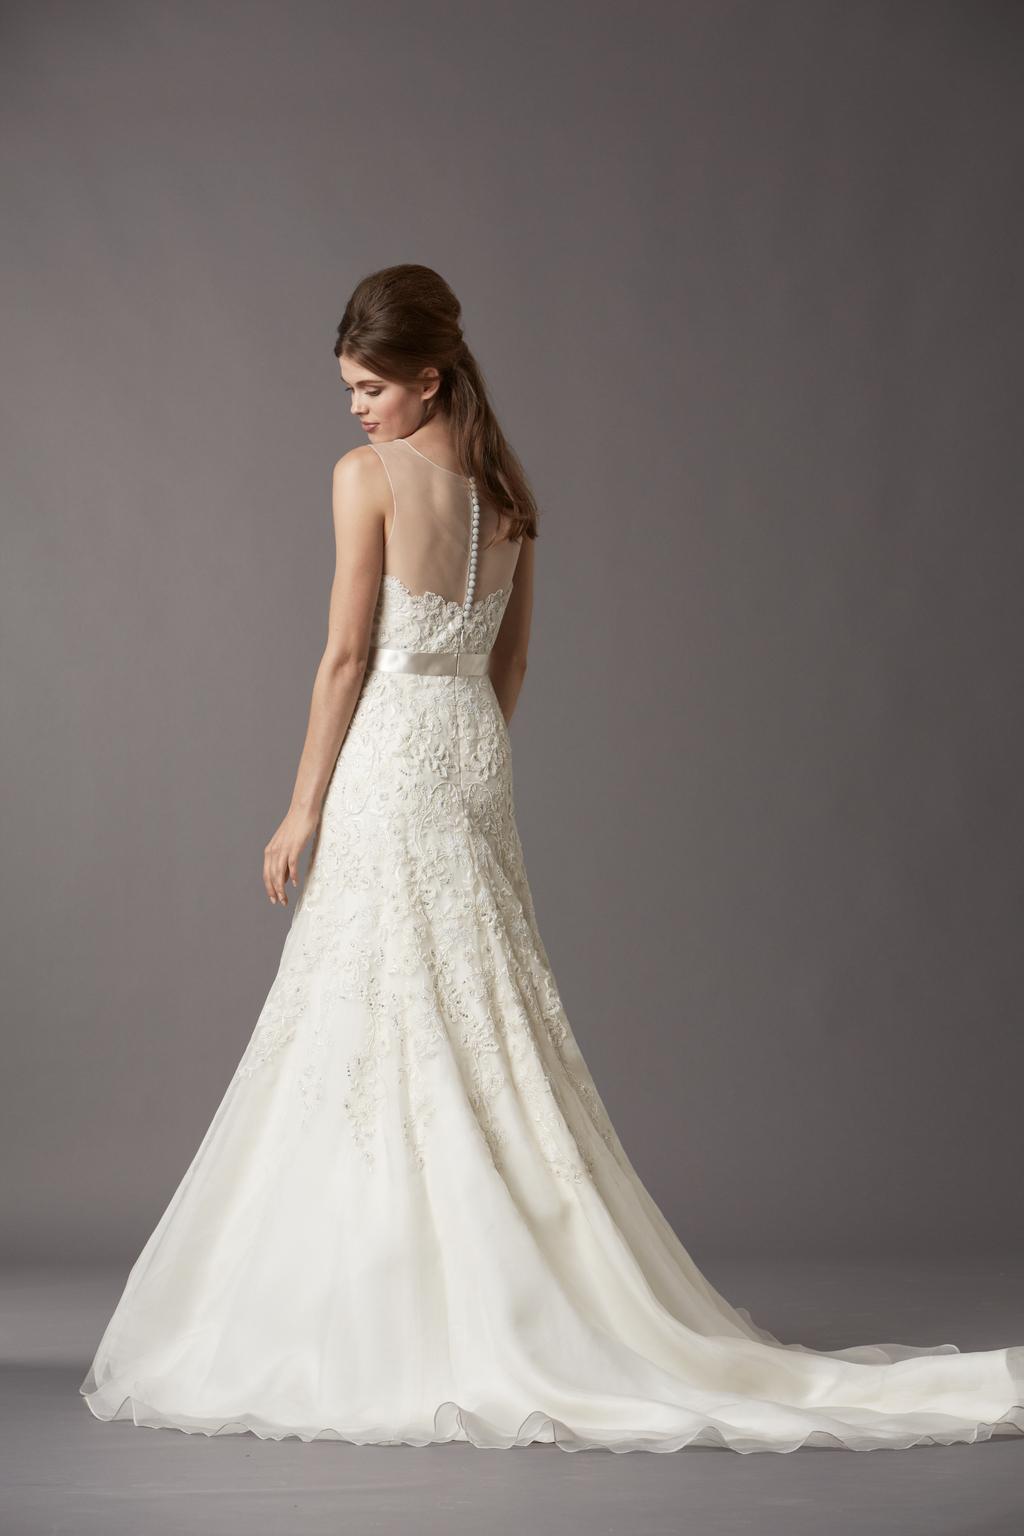 Watters-bridal-gowns-fall-2013-wedding-dress-4071b-a.full